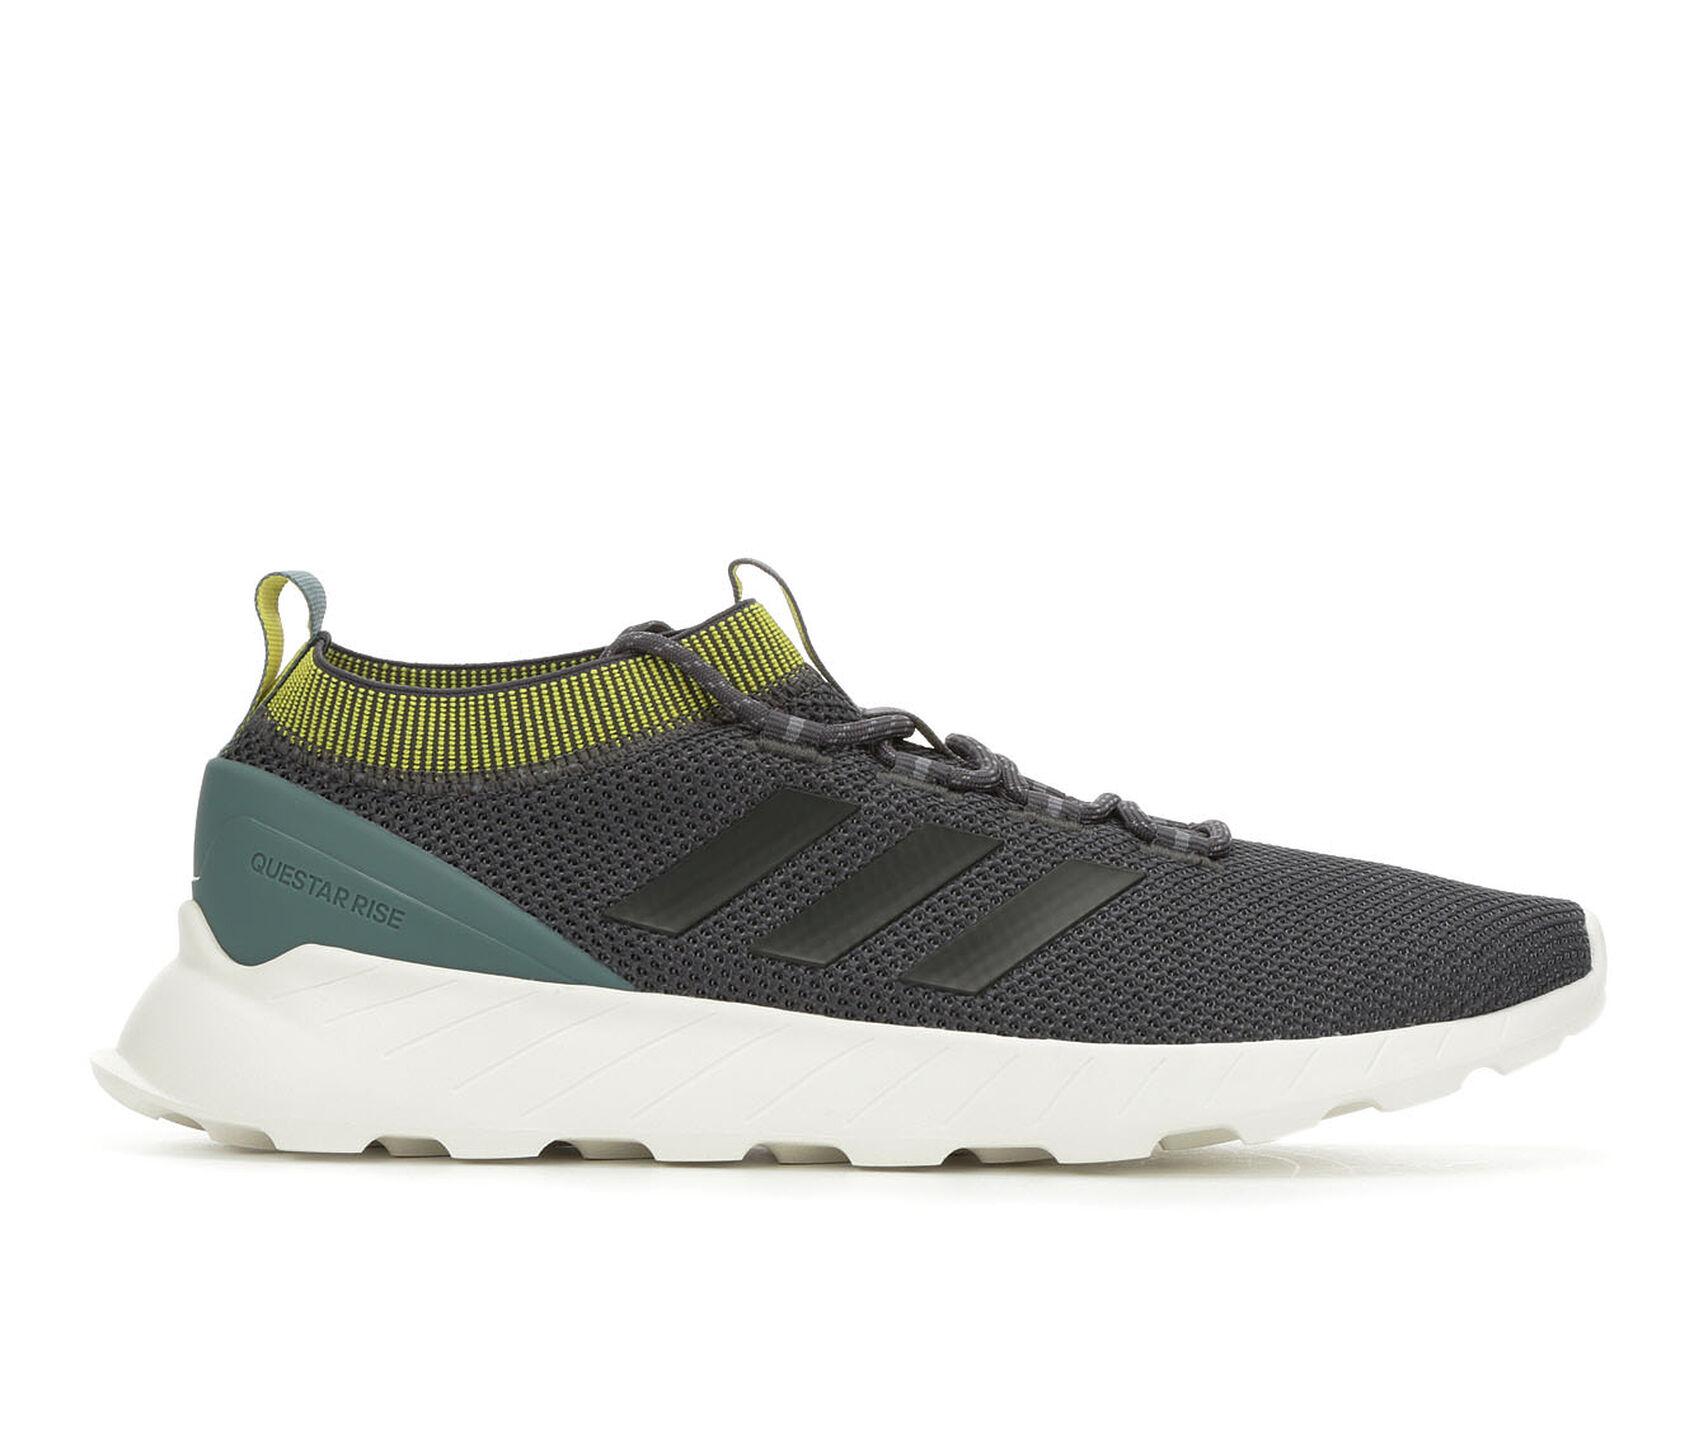 free shipping fdc3e b9d71 ... Adidas Questar Rise Running Shoes. Previous